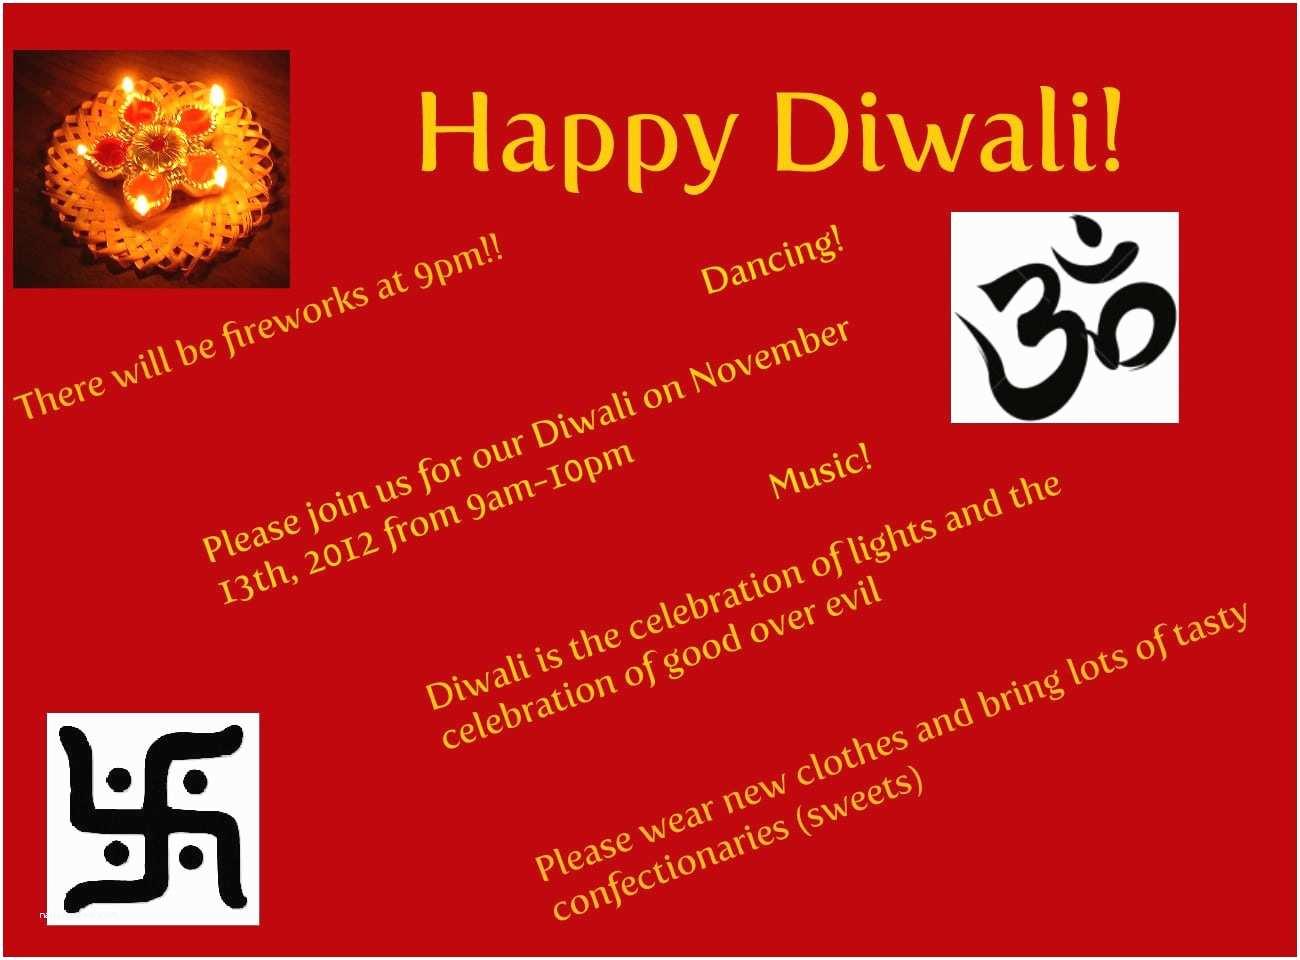 Diwali Party   Wordings For Diwali Party Gallery